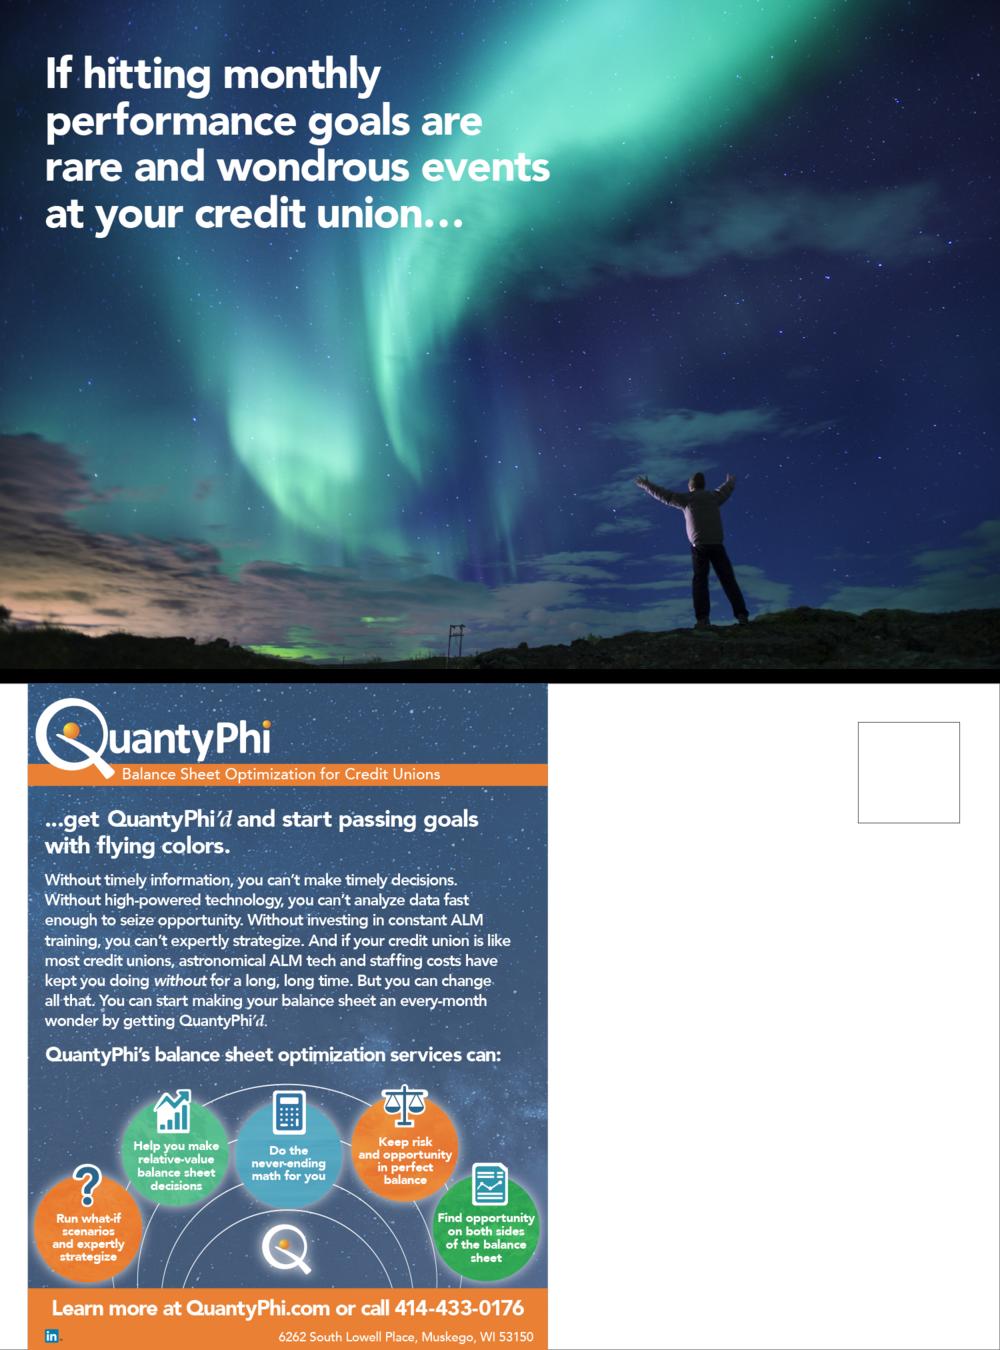 QuantyPhi_Postcards_Star_100917.png